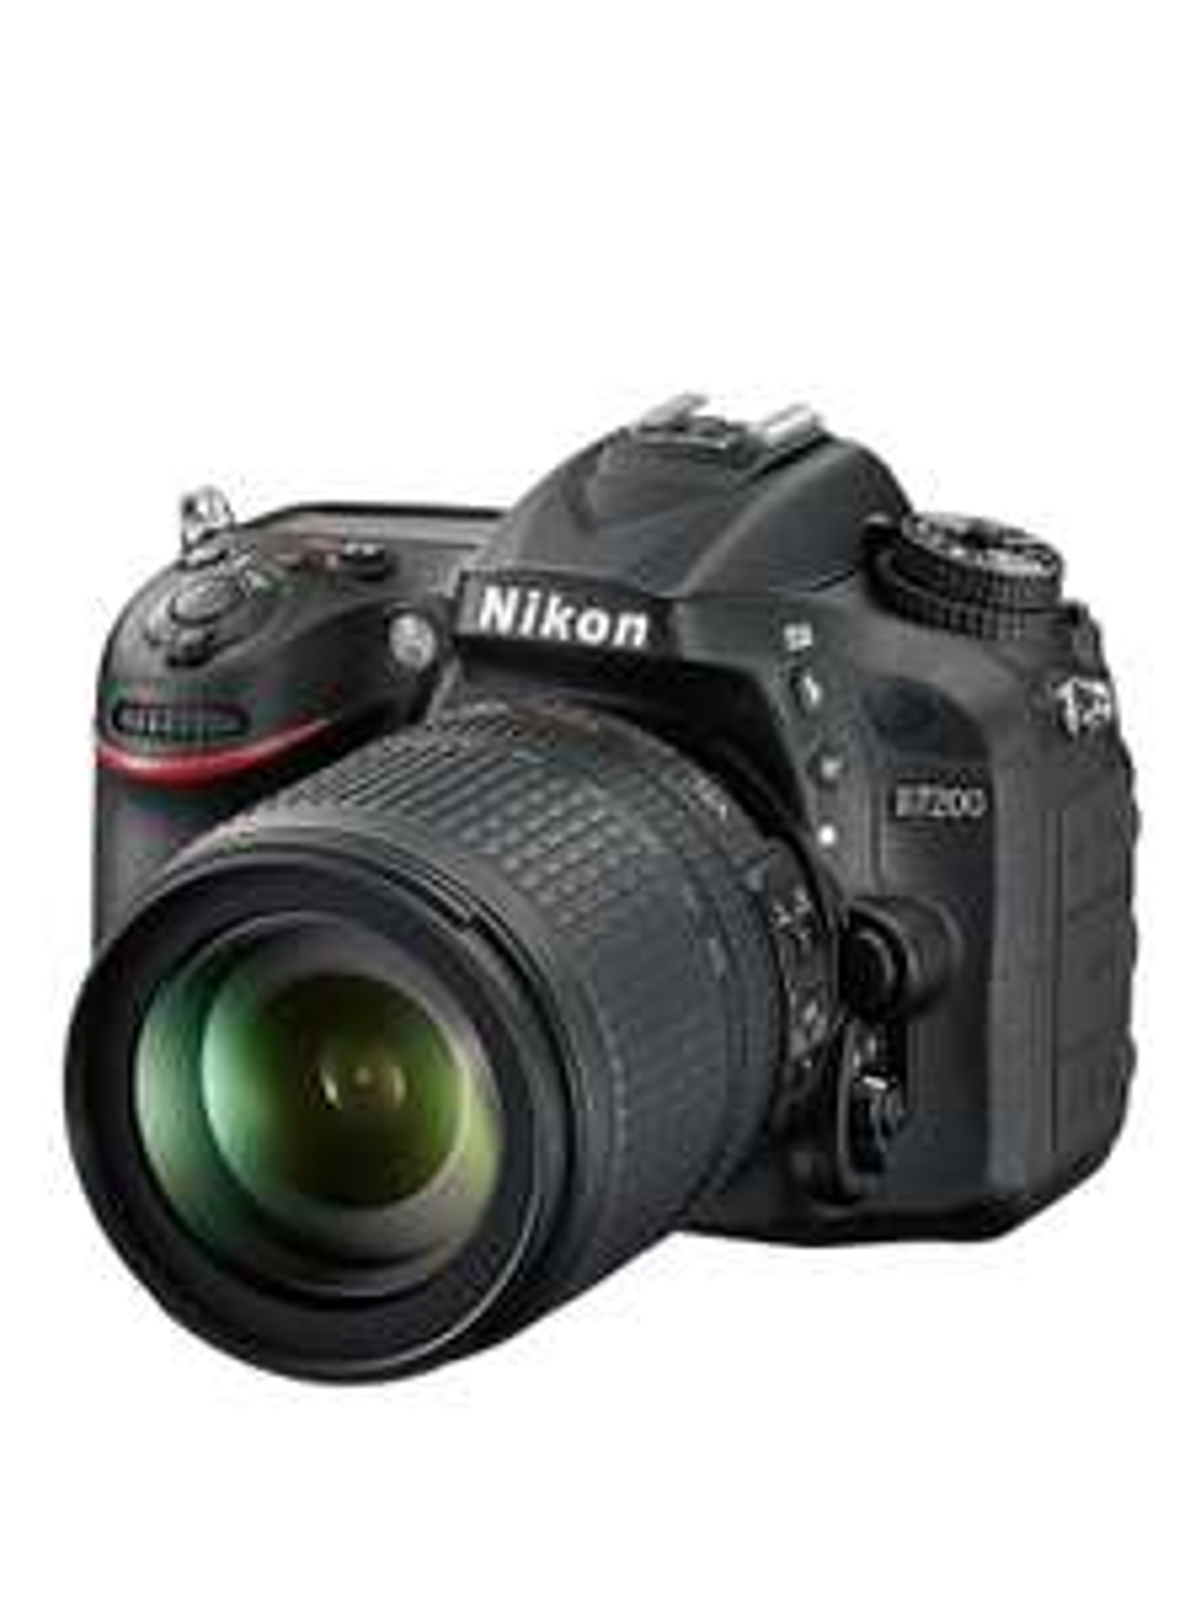 Nikon D7200 with 18-105mm lens - £579.99 @ Argos / eBay